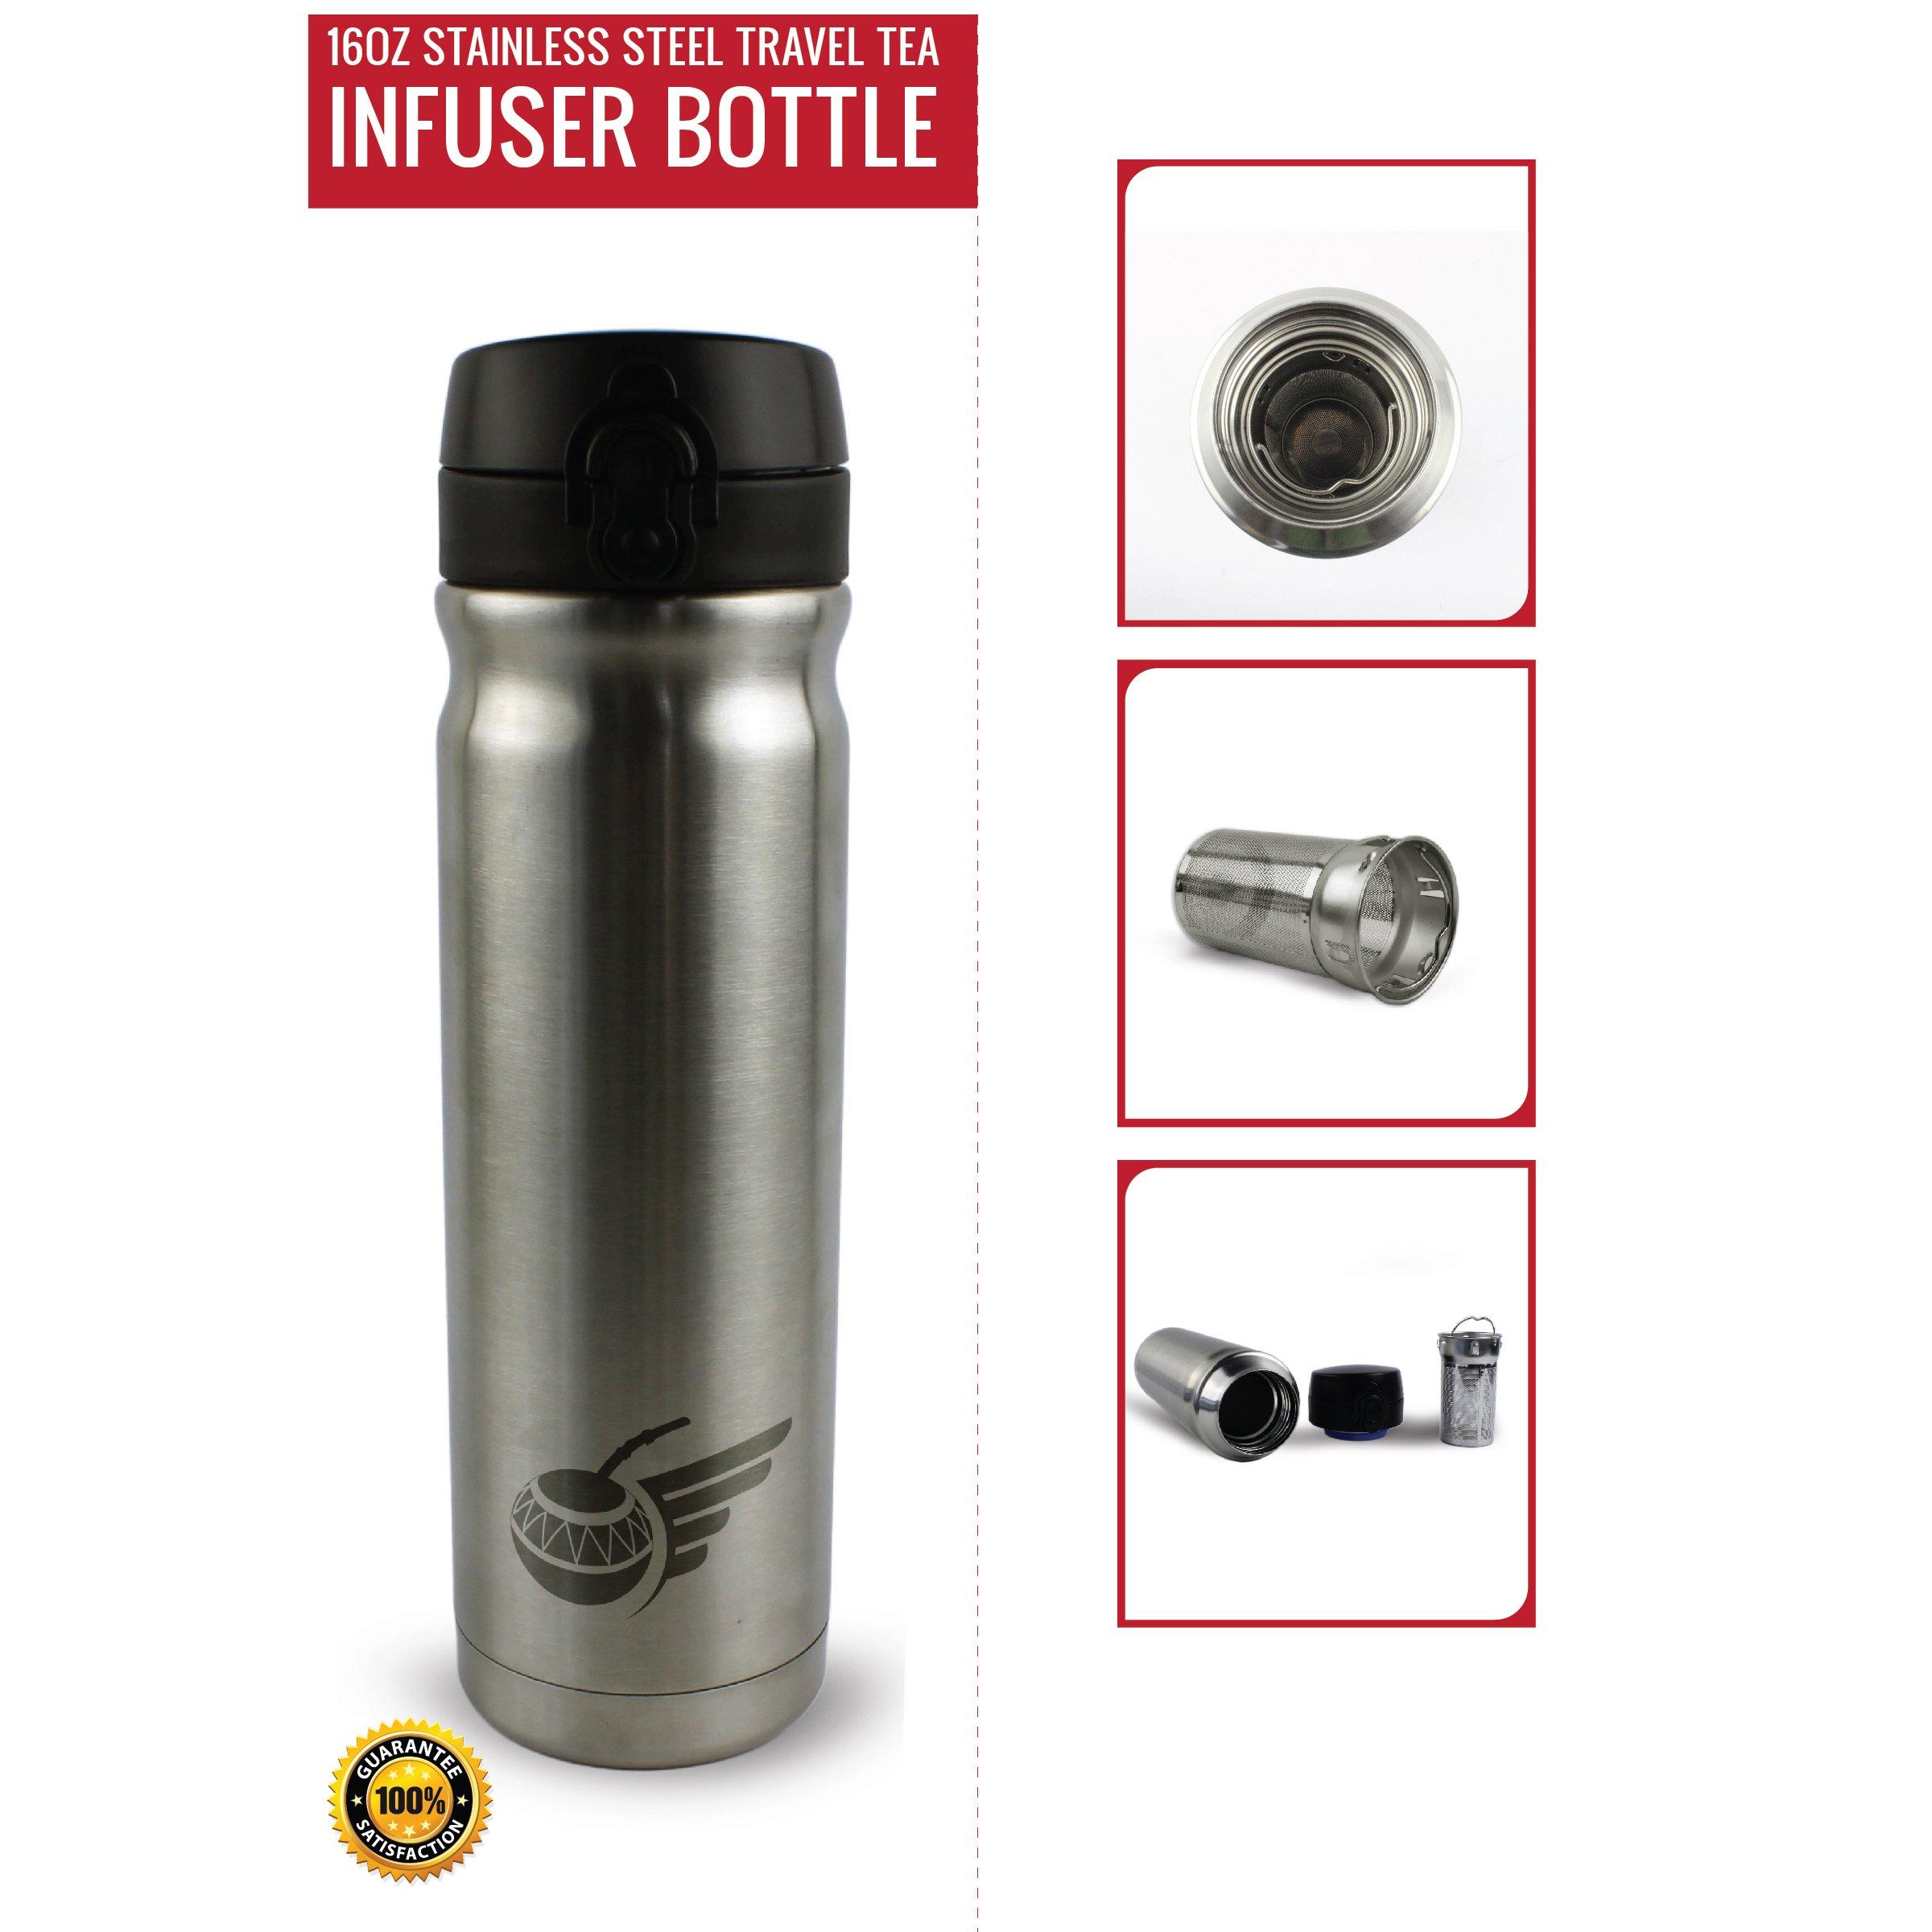 Flying Tea Gourd Travel Tea Infuser Bottle, Loose Leaf, Stainless Steel Tea Thermos with Mesh Tea Basket, 16oz